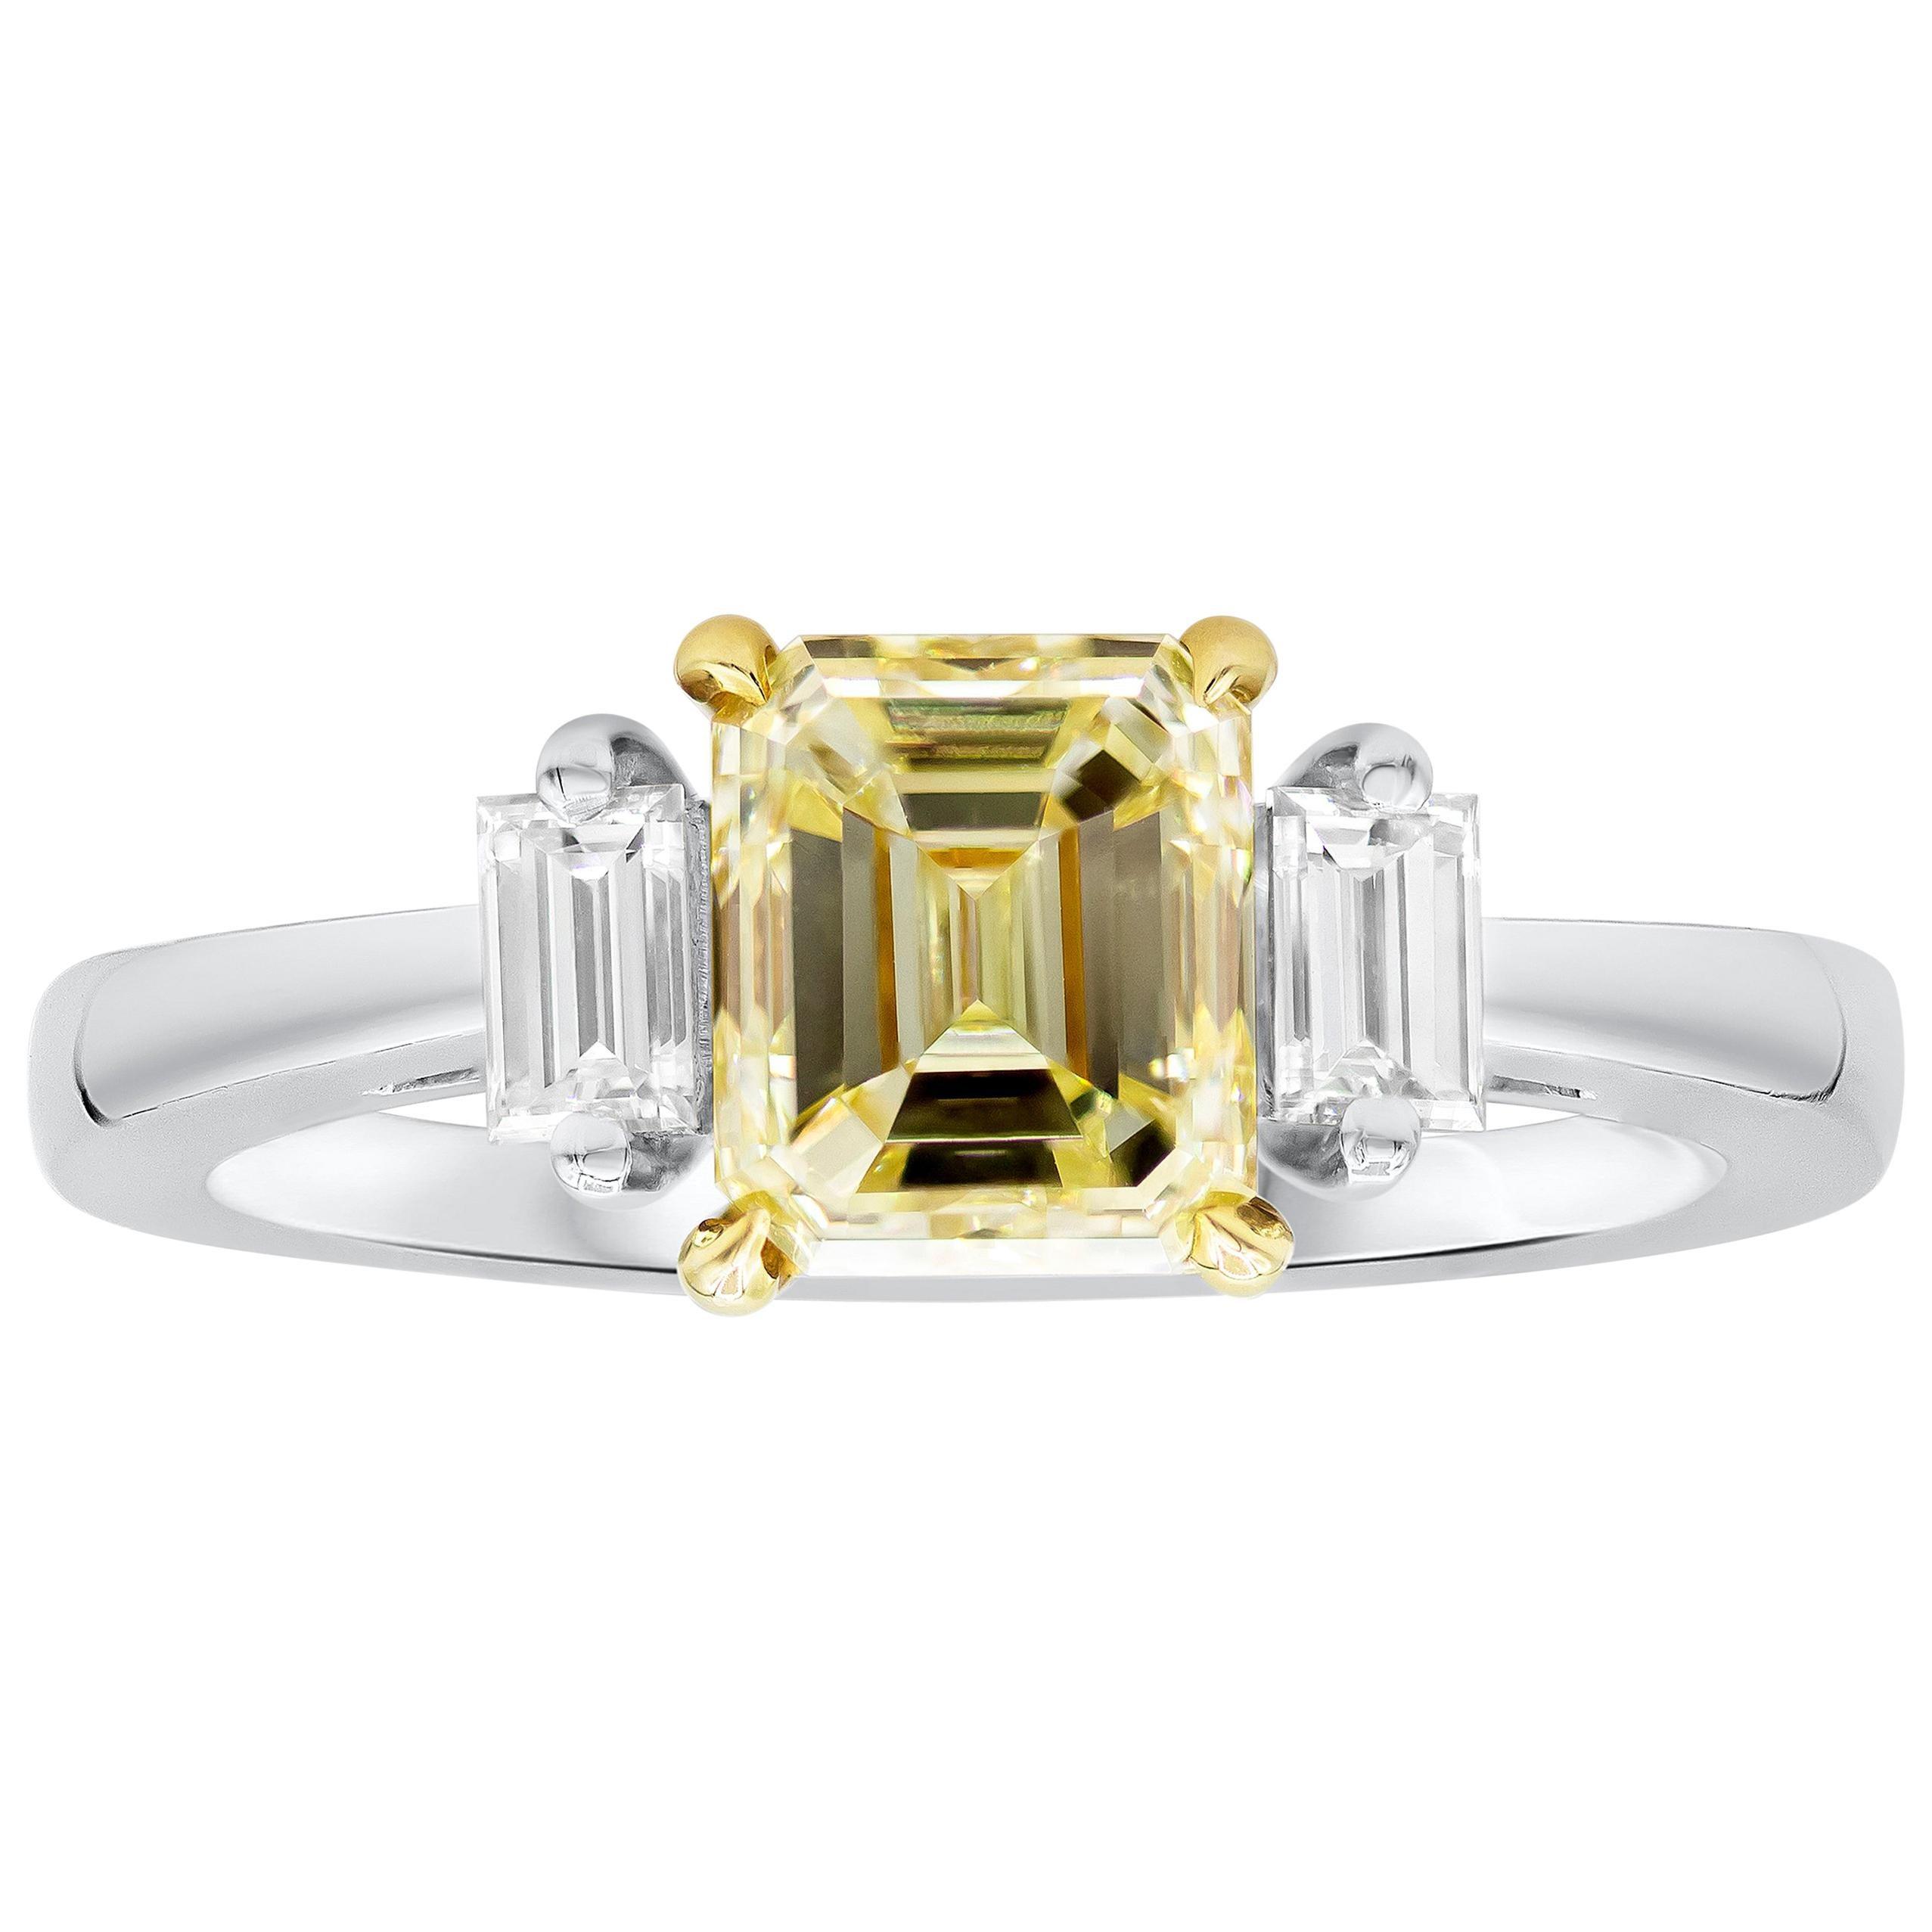 Roman Malakov, Emerald Cut Yellow Diamond Three-Stone Engagement Ring